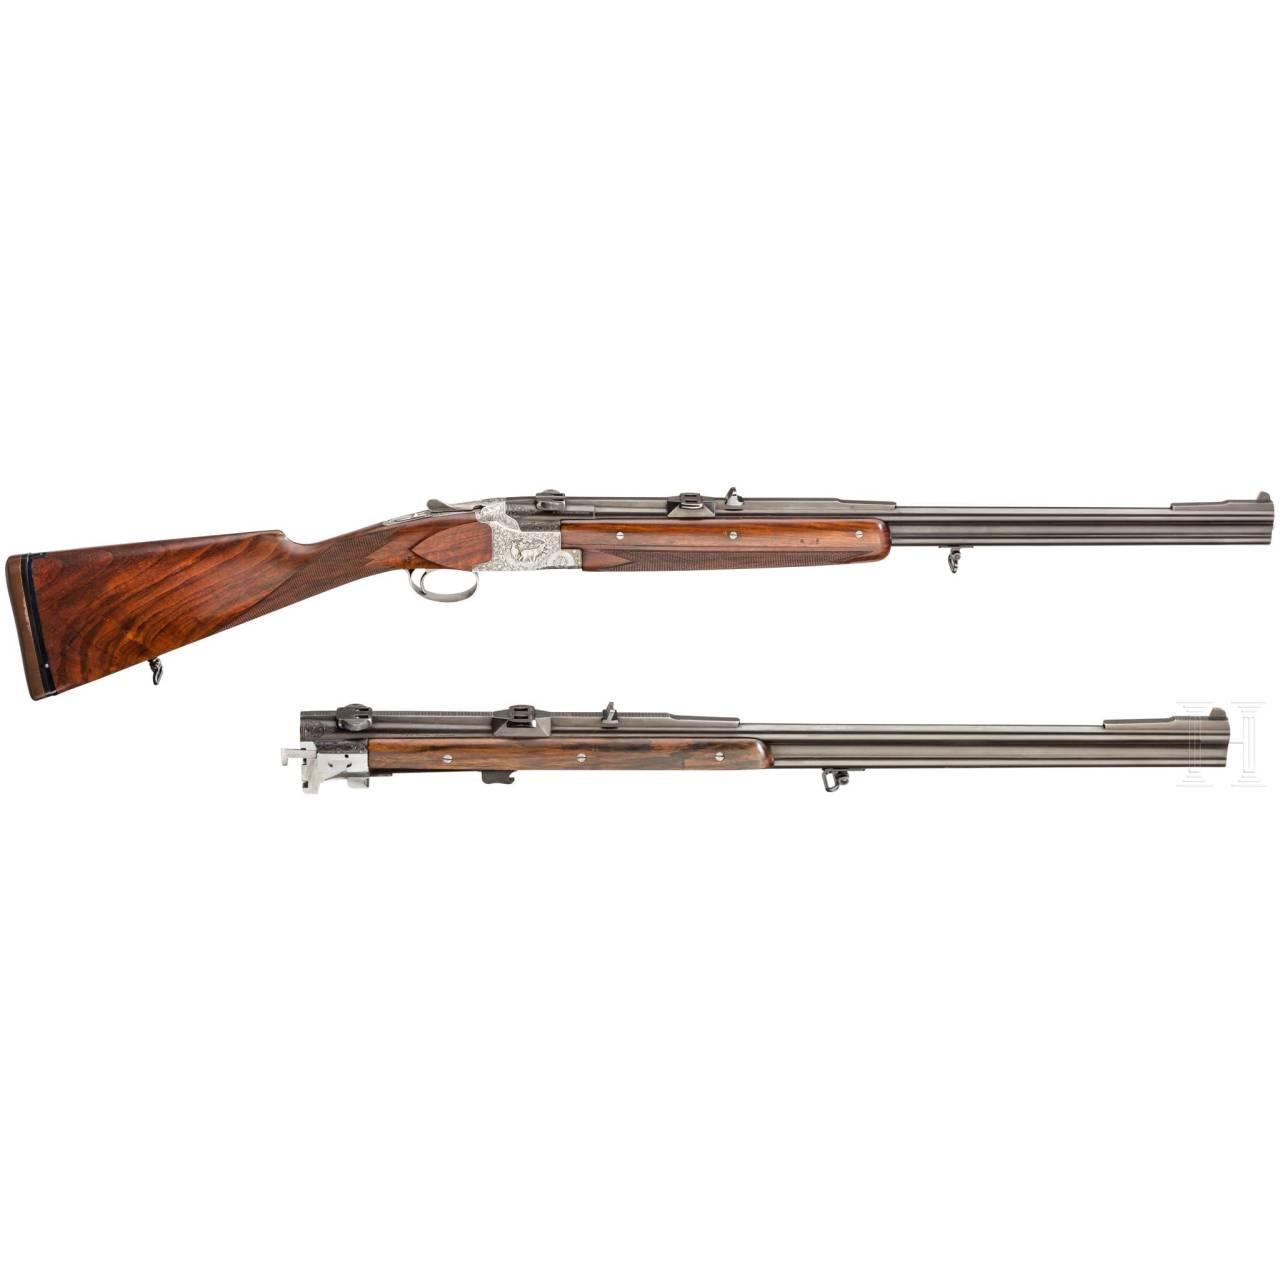 A cased O/U rifle FN Mod. Express with Hertel & Reuss scope and interchangeable O/U rifle barrel with Hertel & Reuss scope